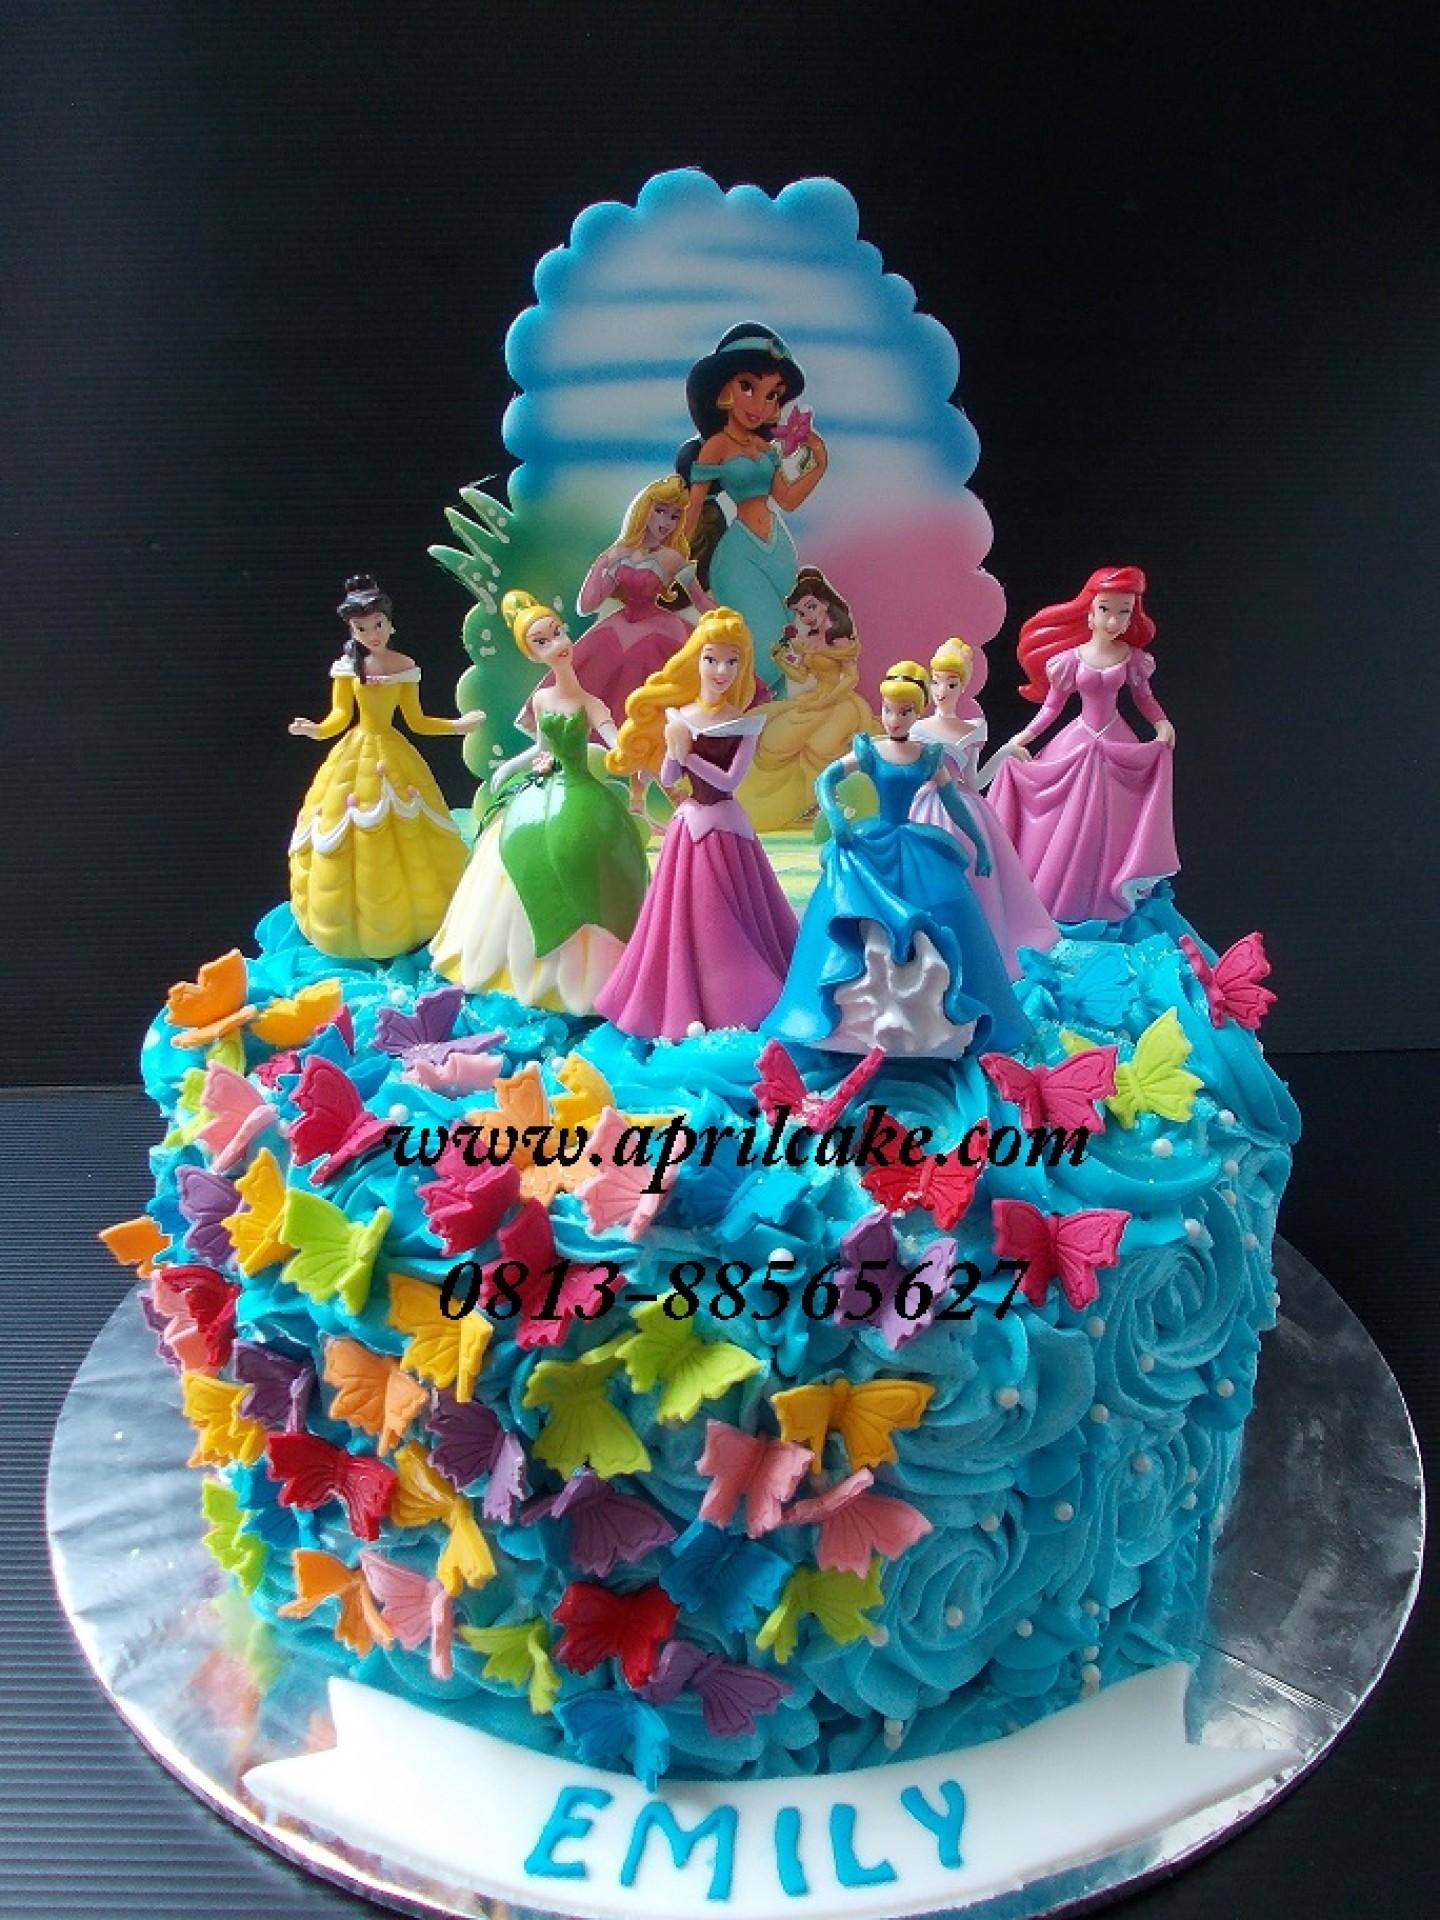 Castle Cake April Cake